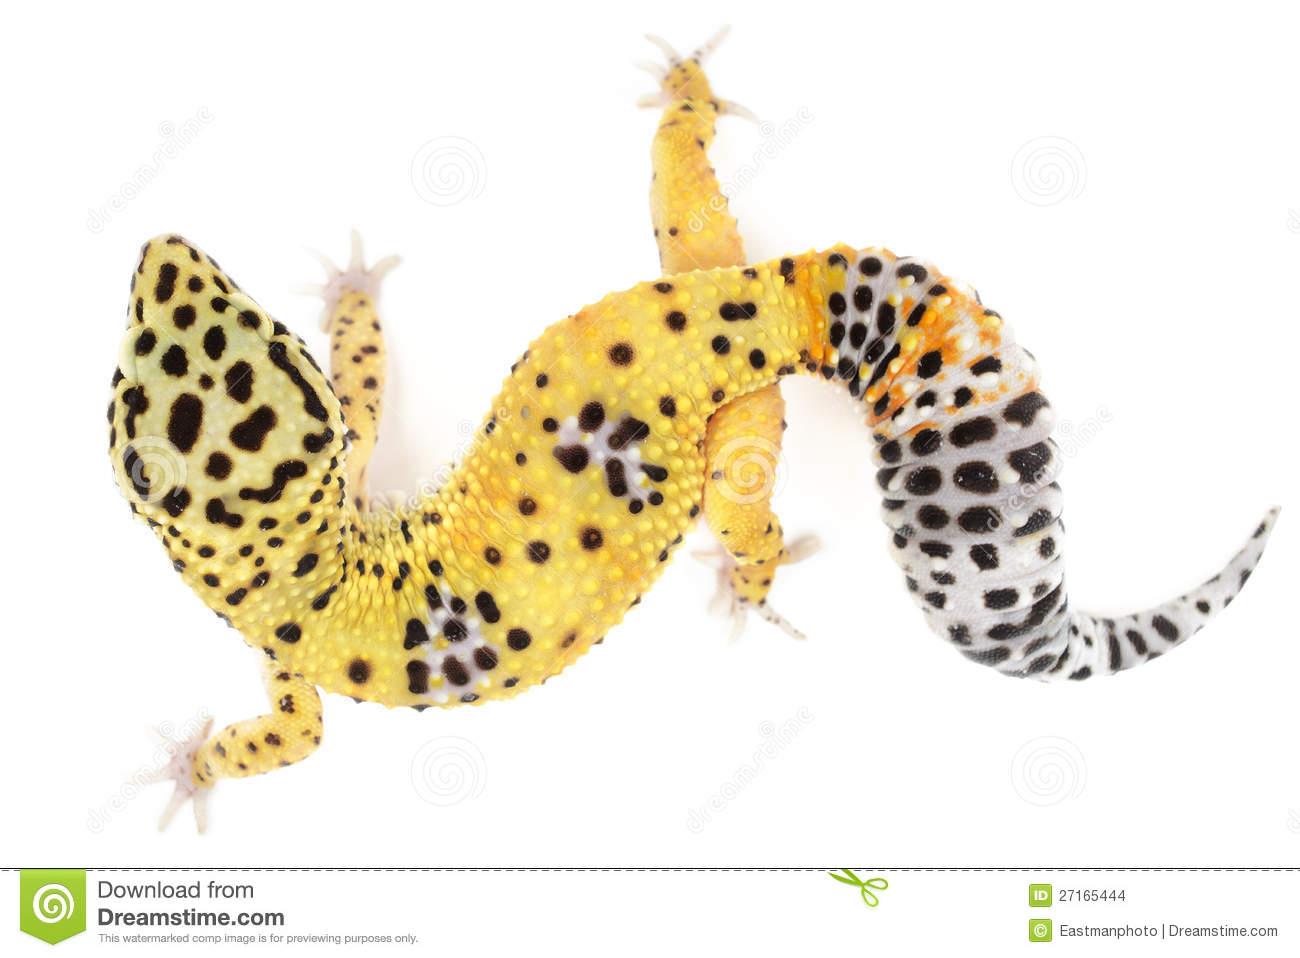 Leopard gecko clipart 1 » Clipart Station.